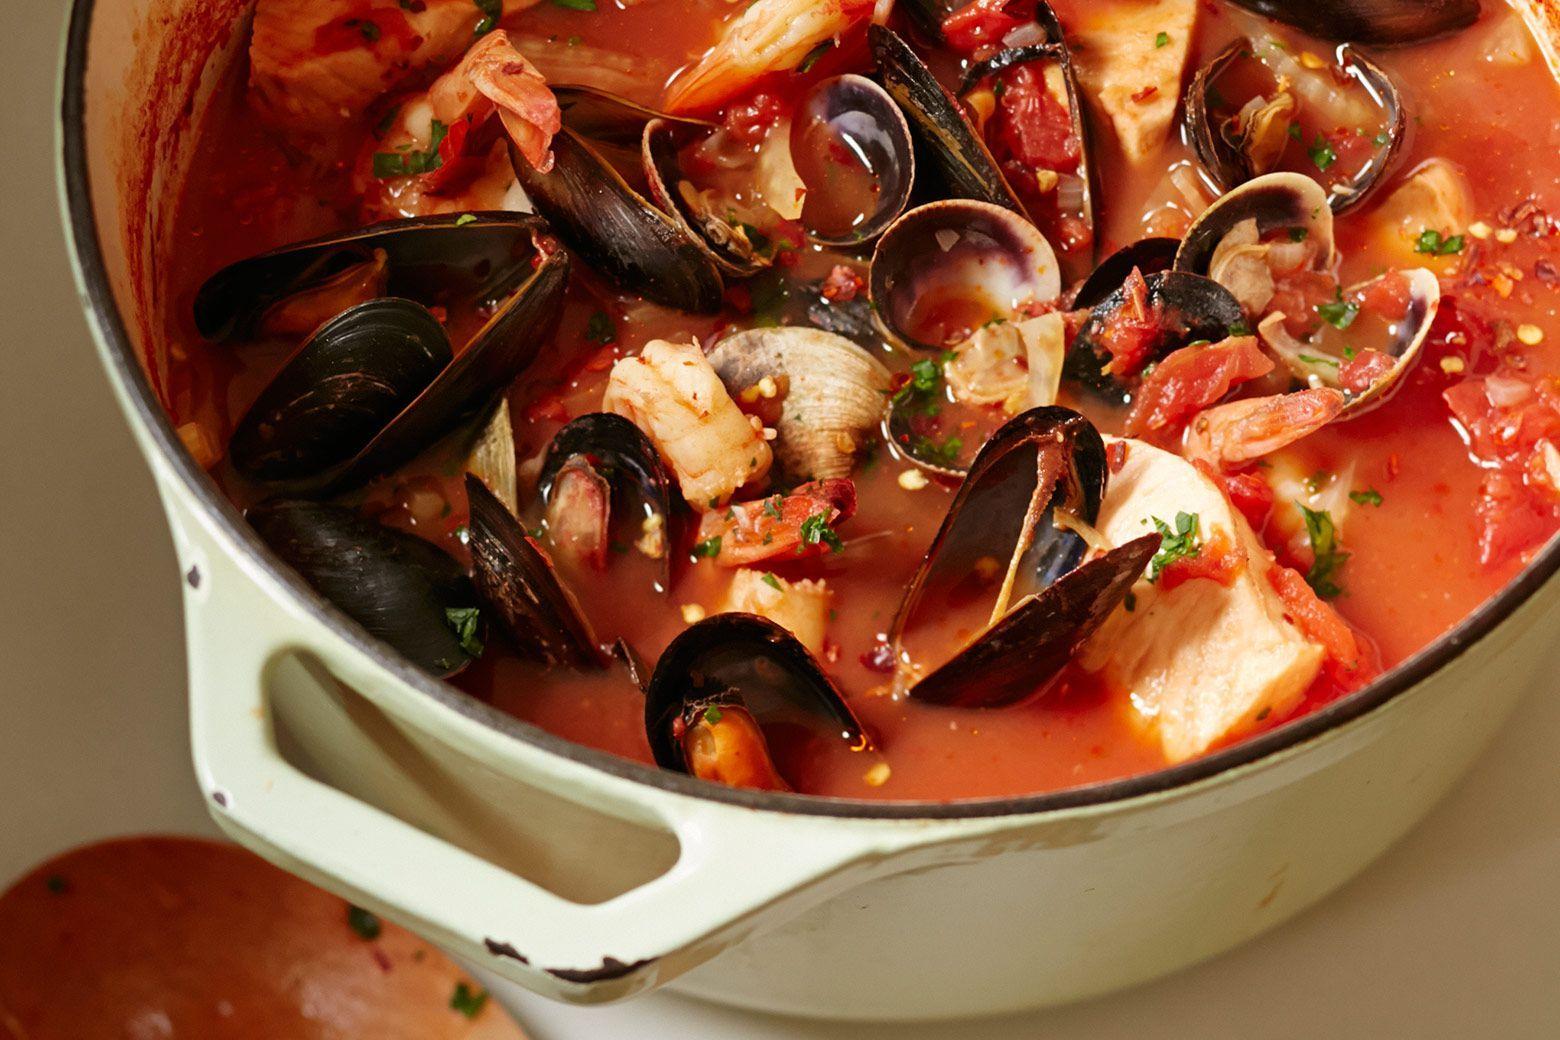 Slow cooker cioppino by giada de laurentiis giadaweekly for Crockpot fish recipes